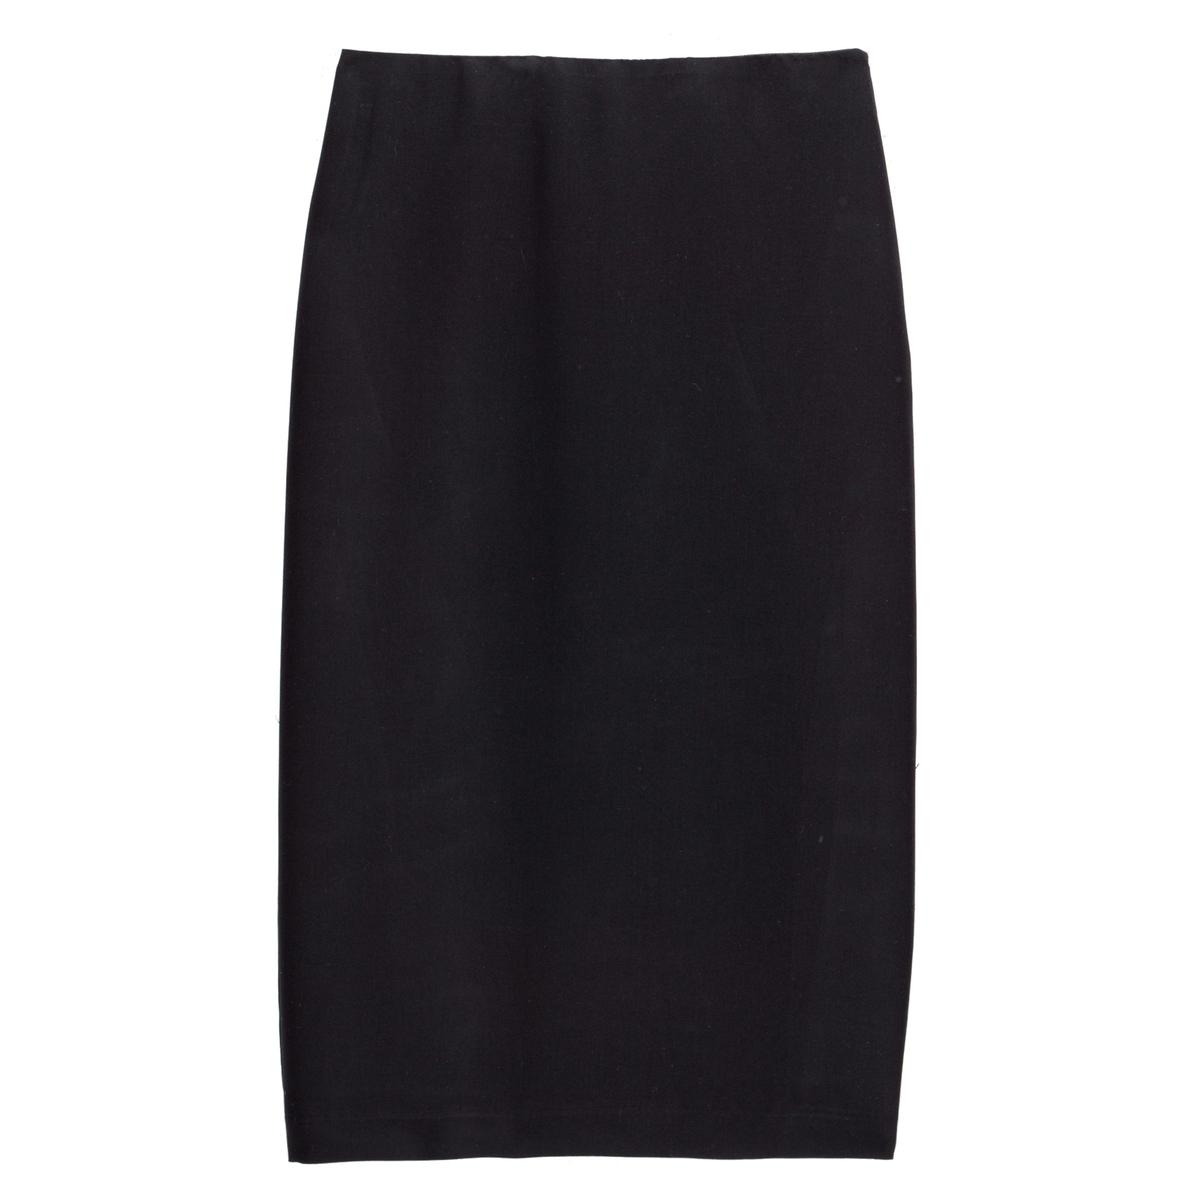 Falda de tubo con largo bajo la rodilla